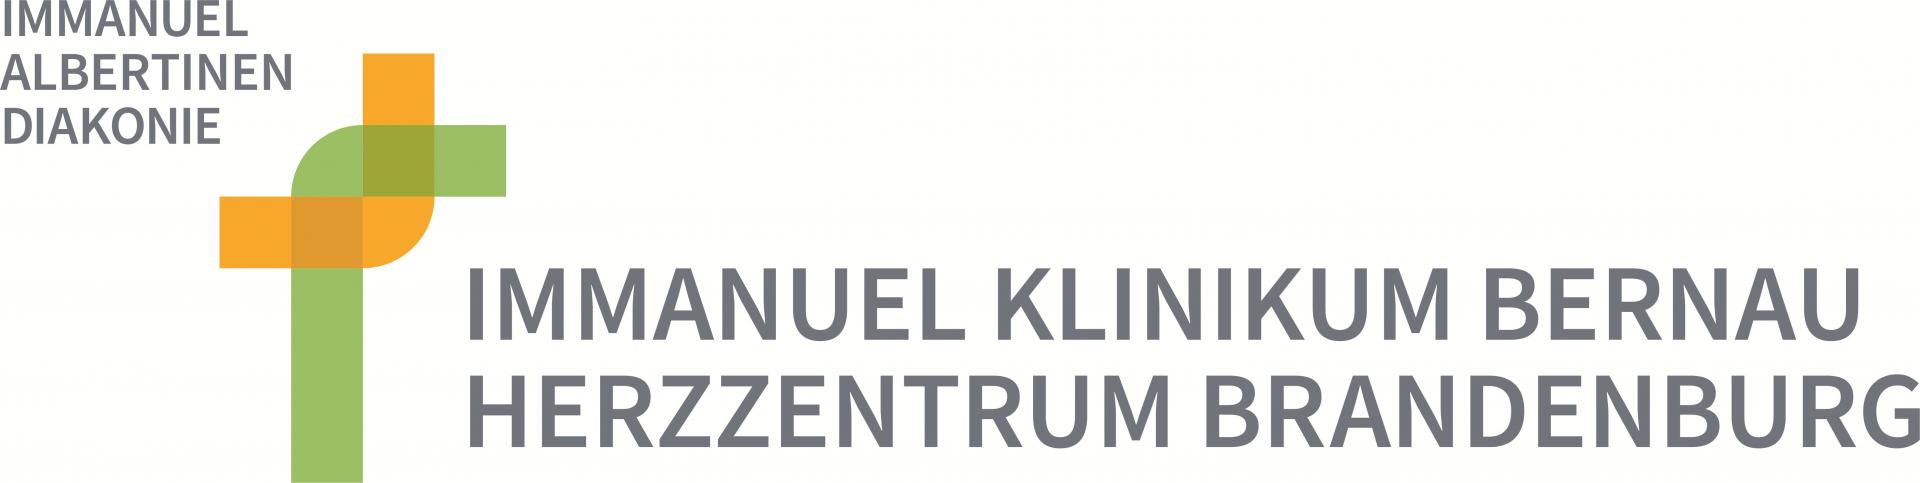 Immanuel Klinikum Bernau